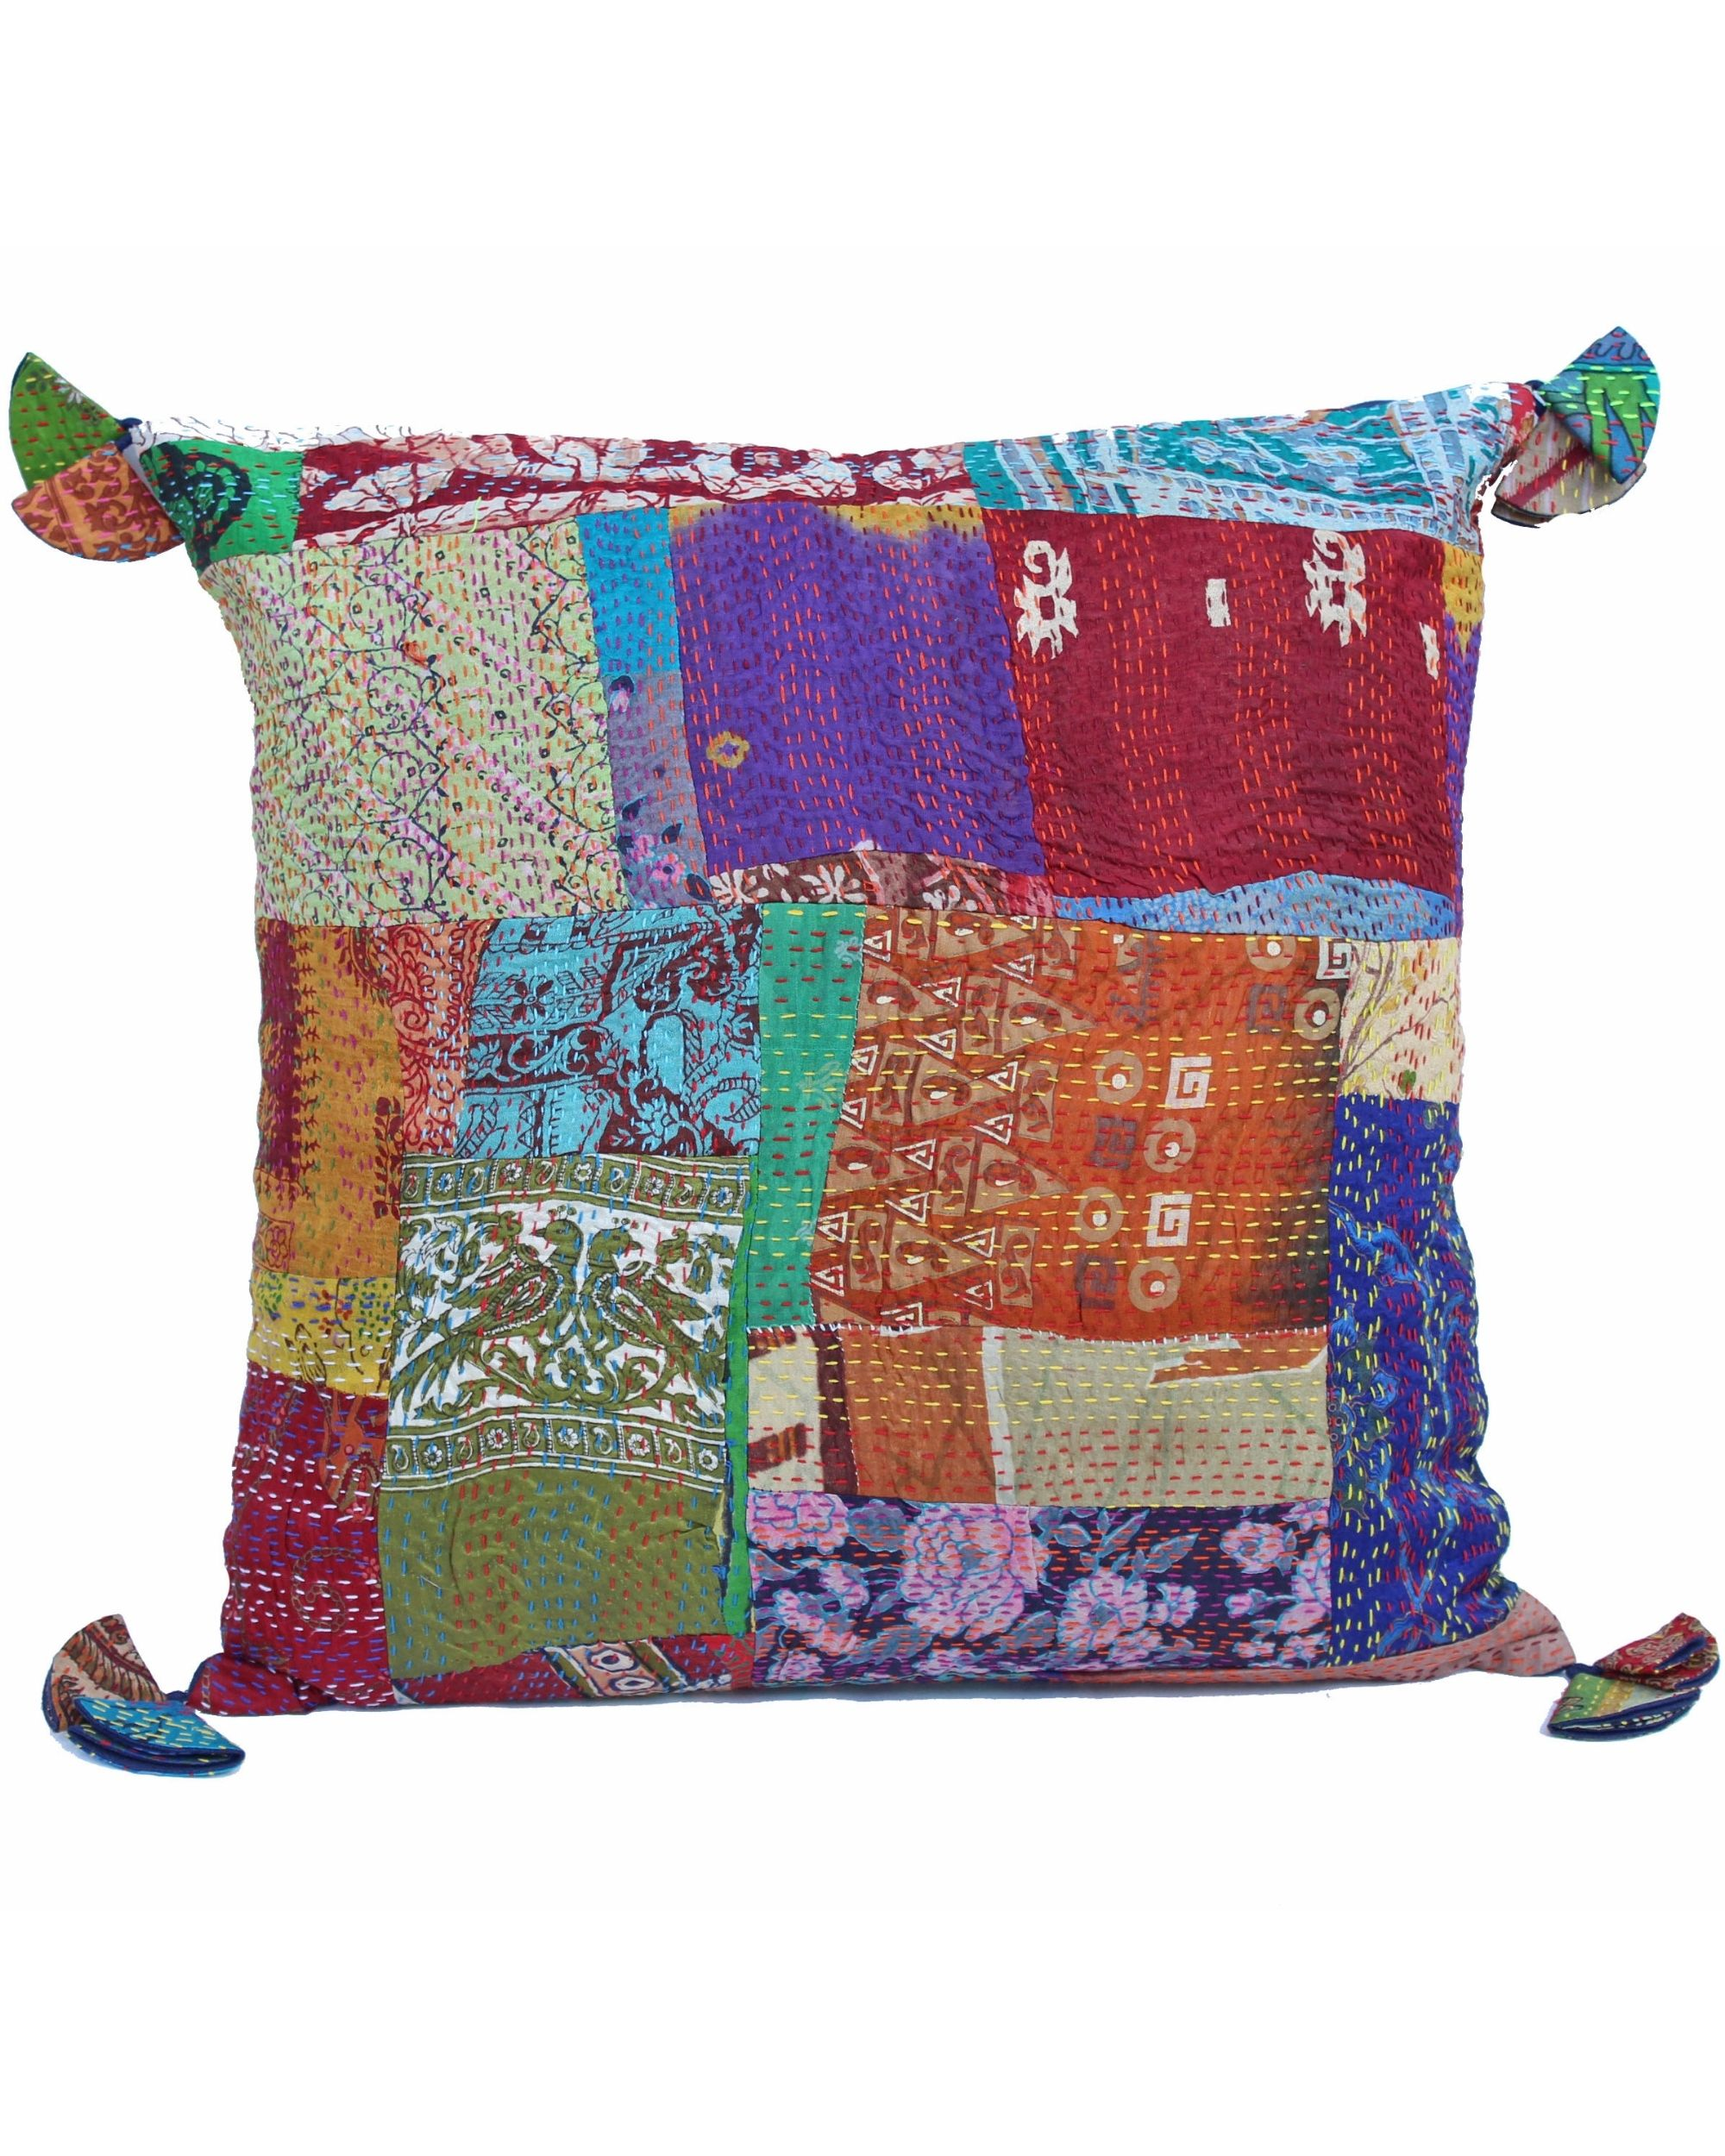 Vintage silk kantha cushion cover - small